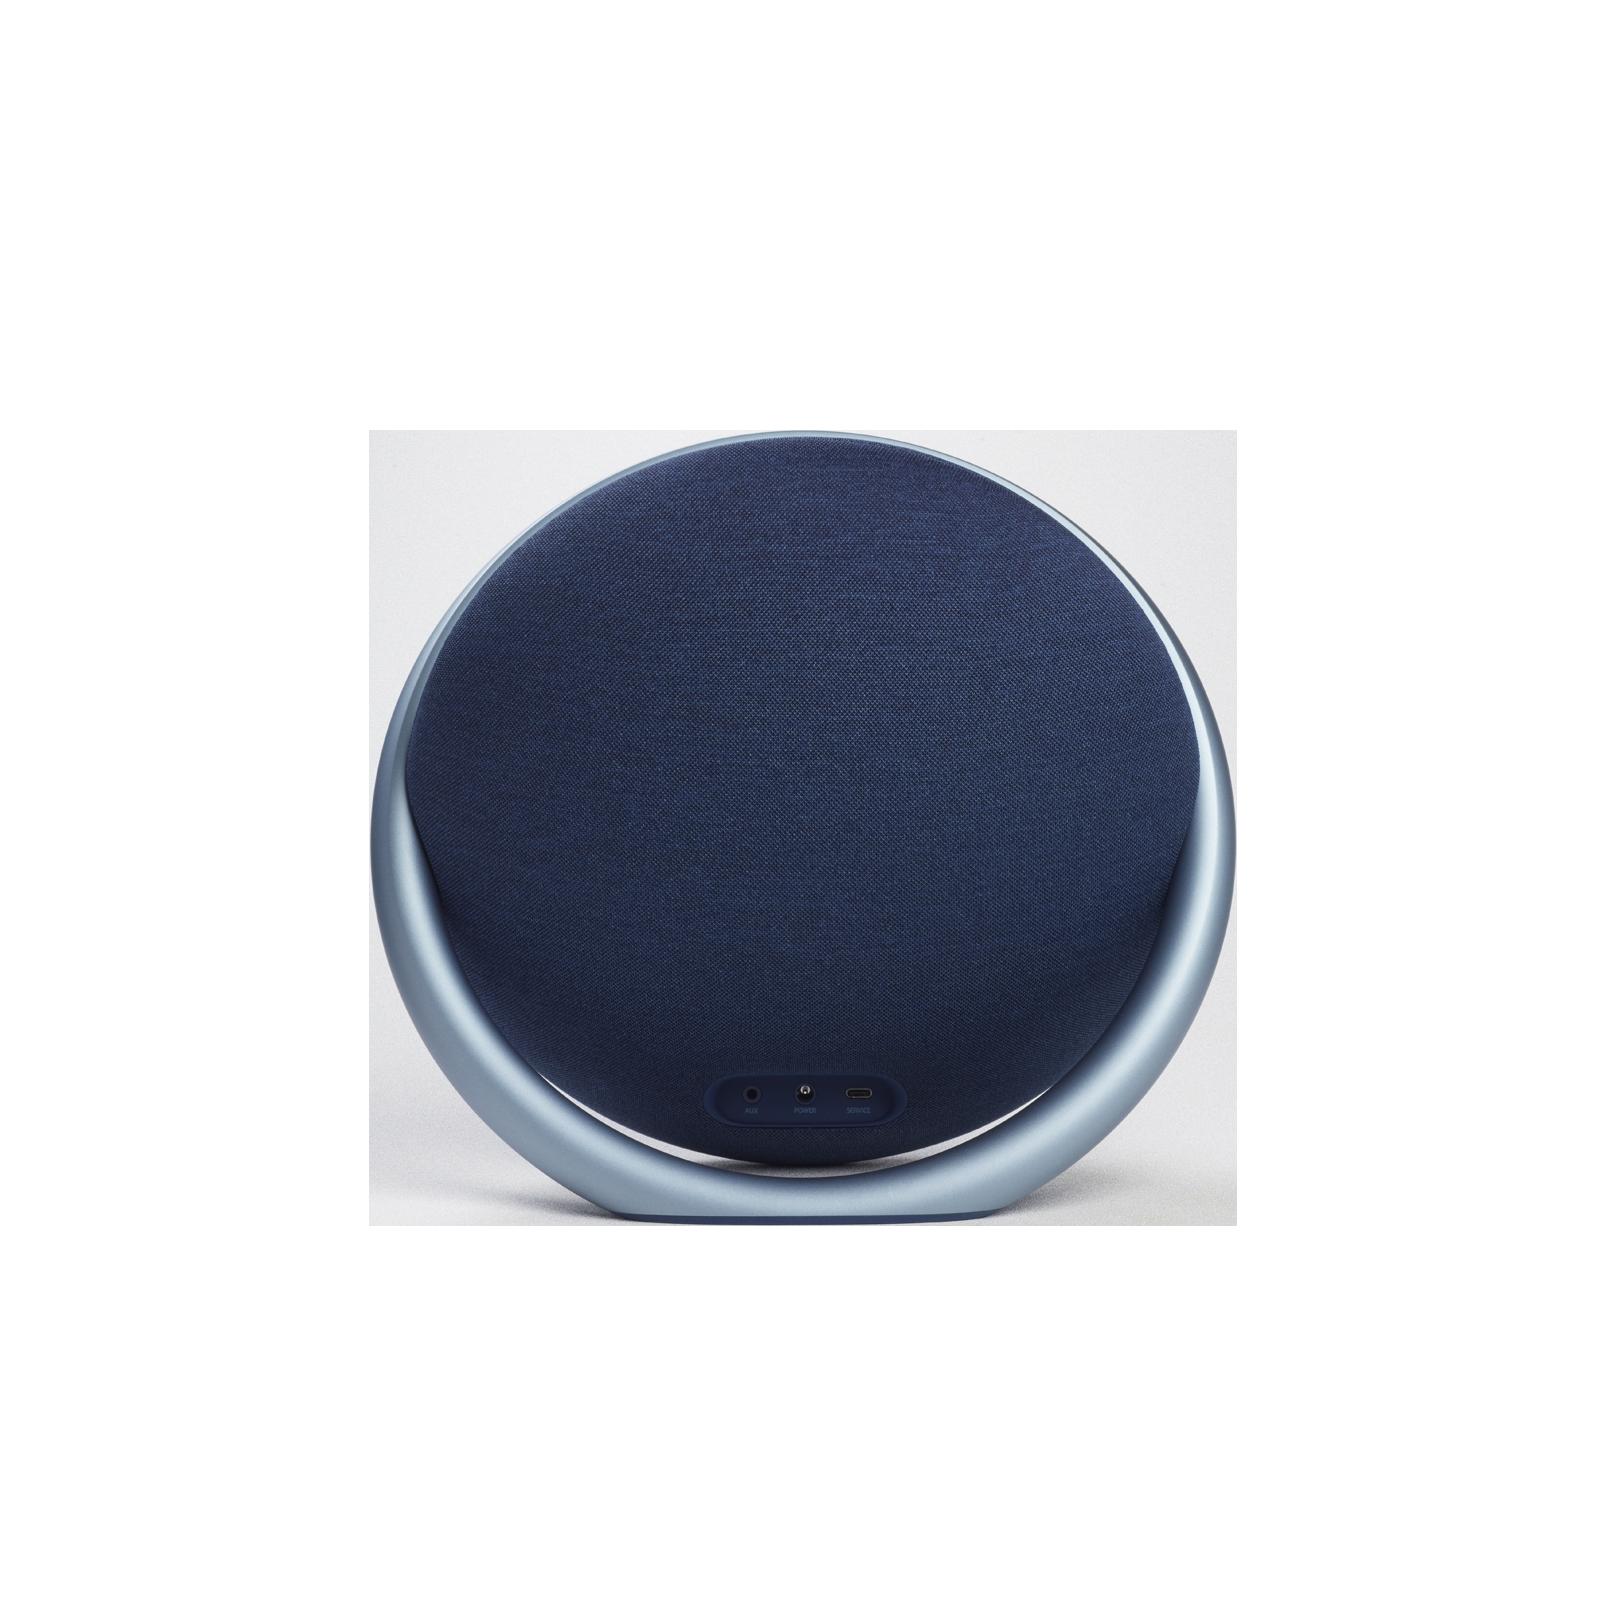 Onyx Studio 7 - Blue - Portable Stereo Bluetooth Speaker - Back